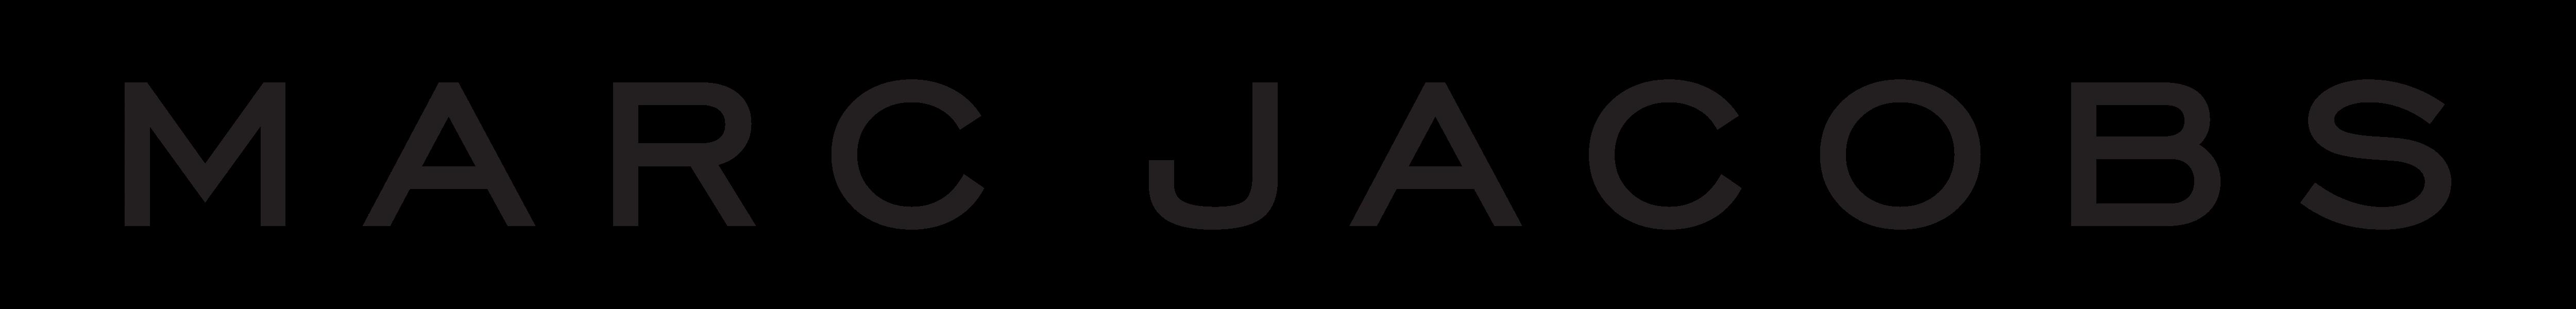 Marc Jacobs – Logos Download